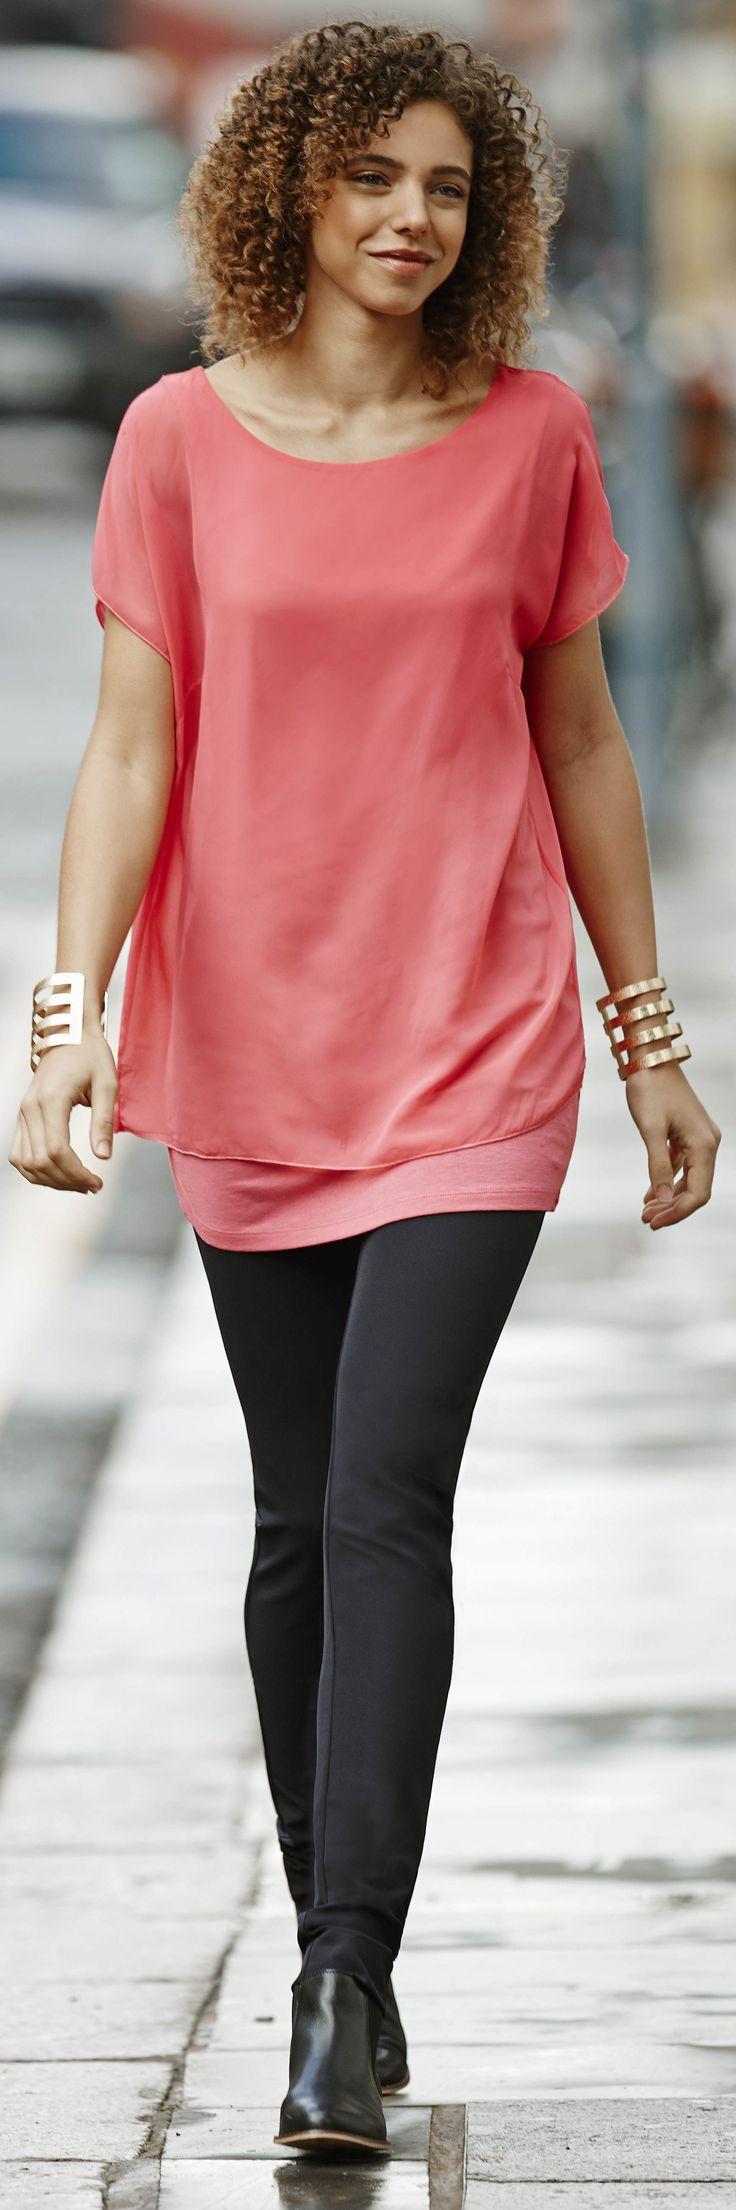 268 best clothing for apple shaped women - plus size (& regular